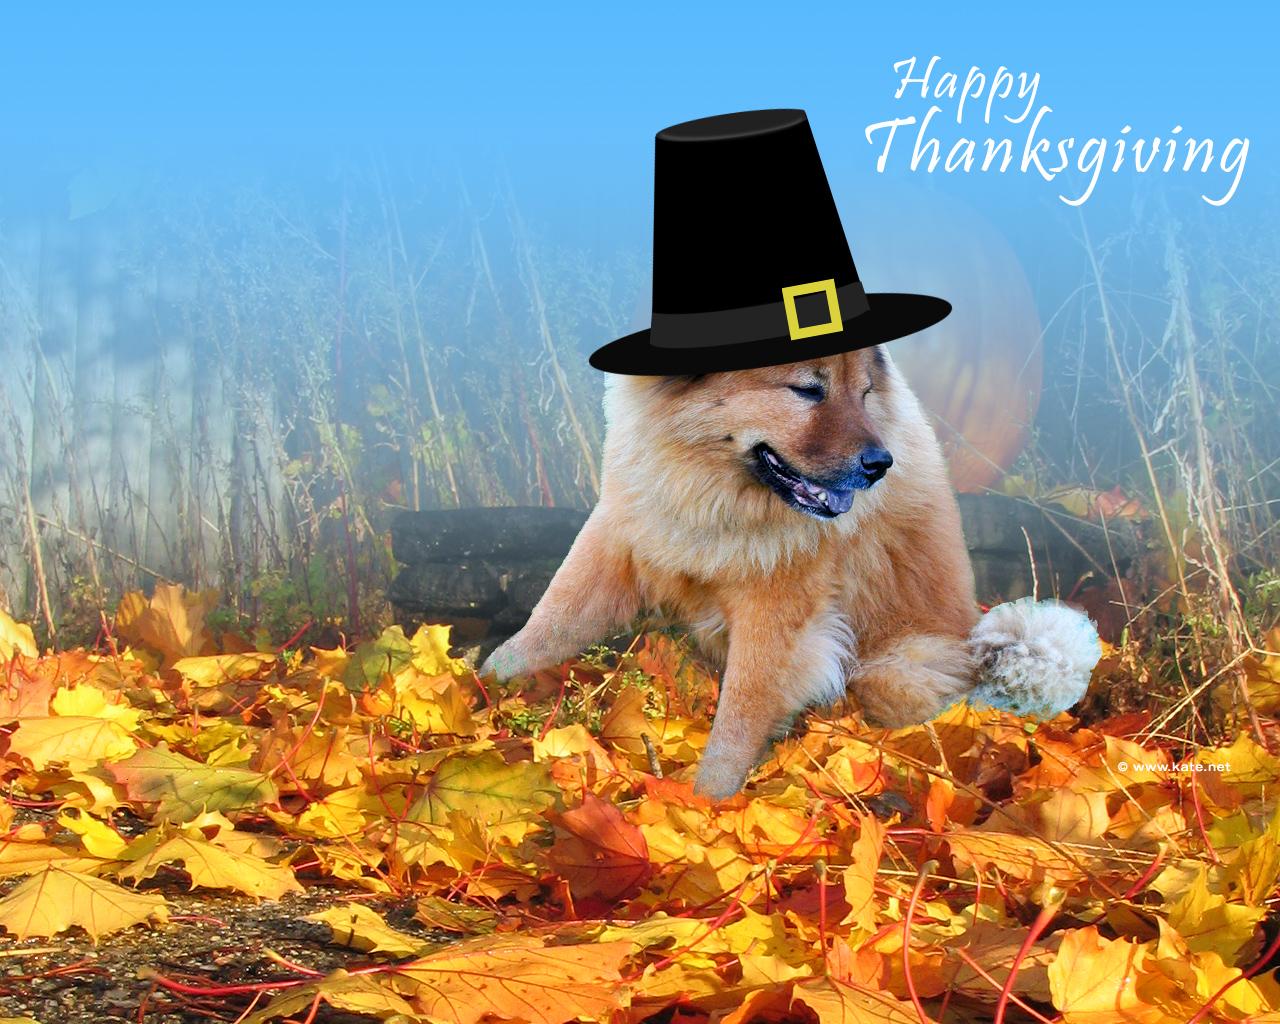 download desktop backgrounds thanksgiving desktop backgrounds 1280x1024